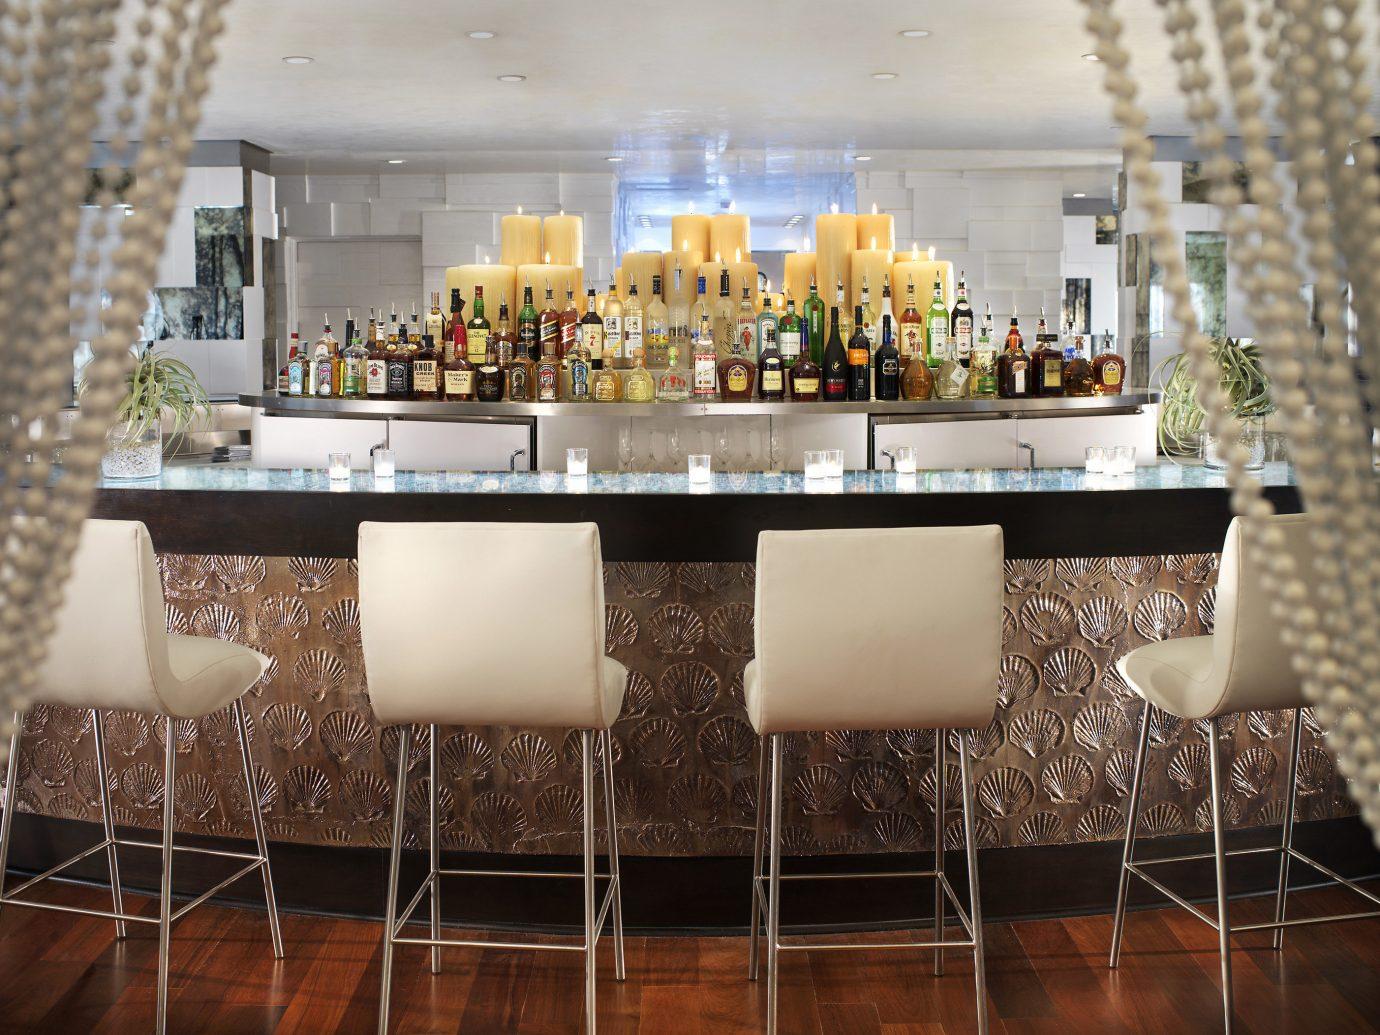 Food + Drink indoor room meal interior design restaurant table Design dining room centrepiece Bar several dining table